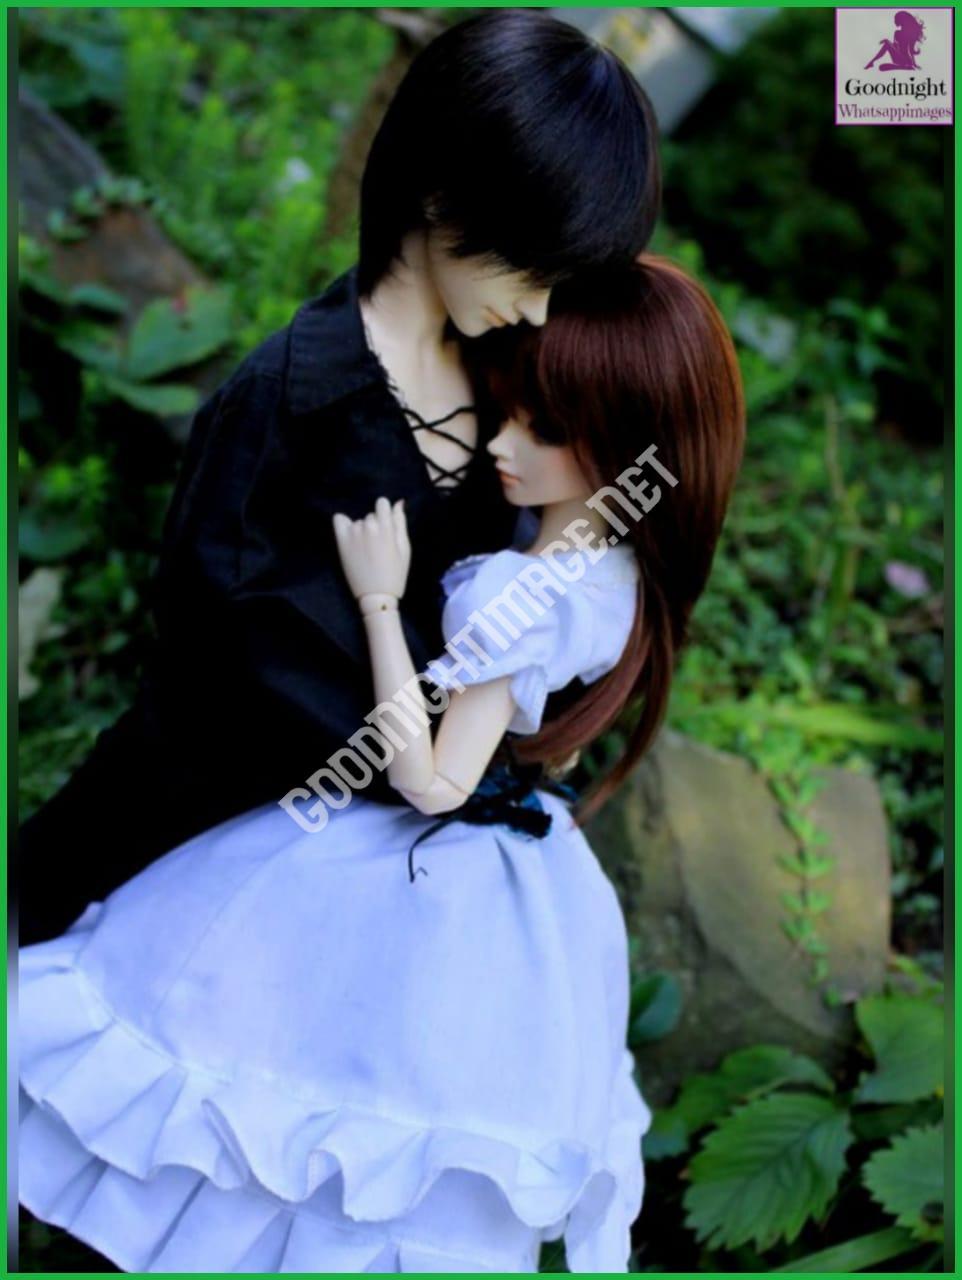 31+CUTE LOVE COUPLE WHATSAPP DP IMAGES wallpaper photo ...